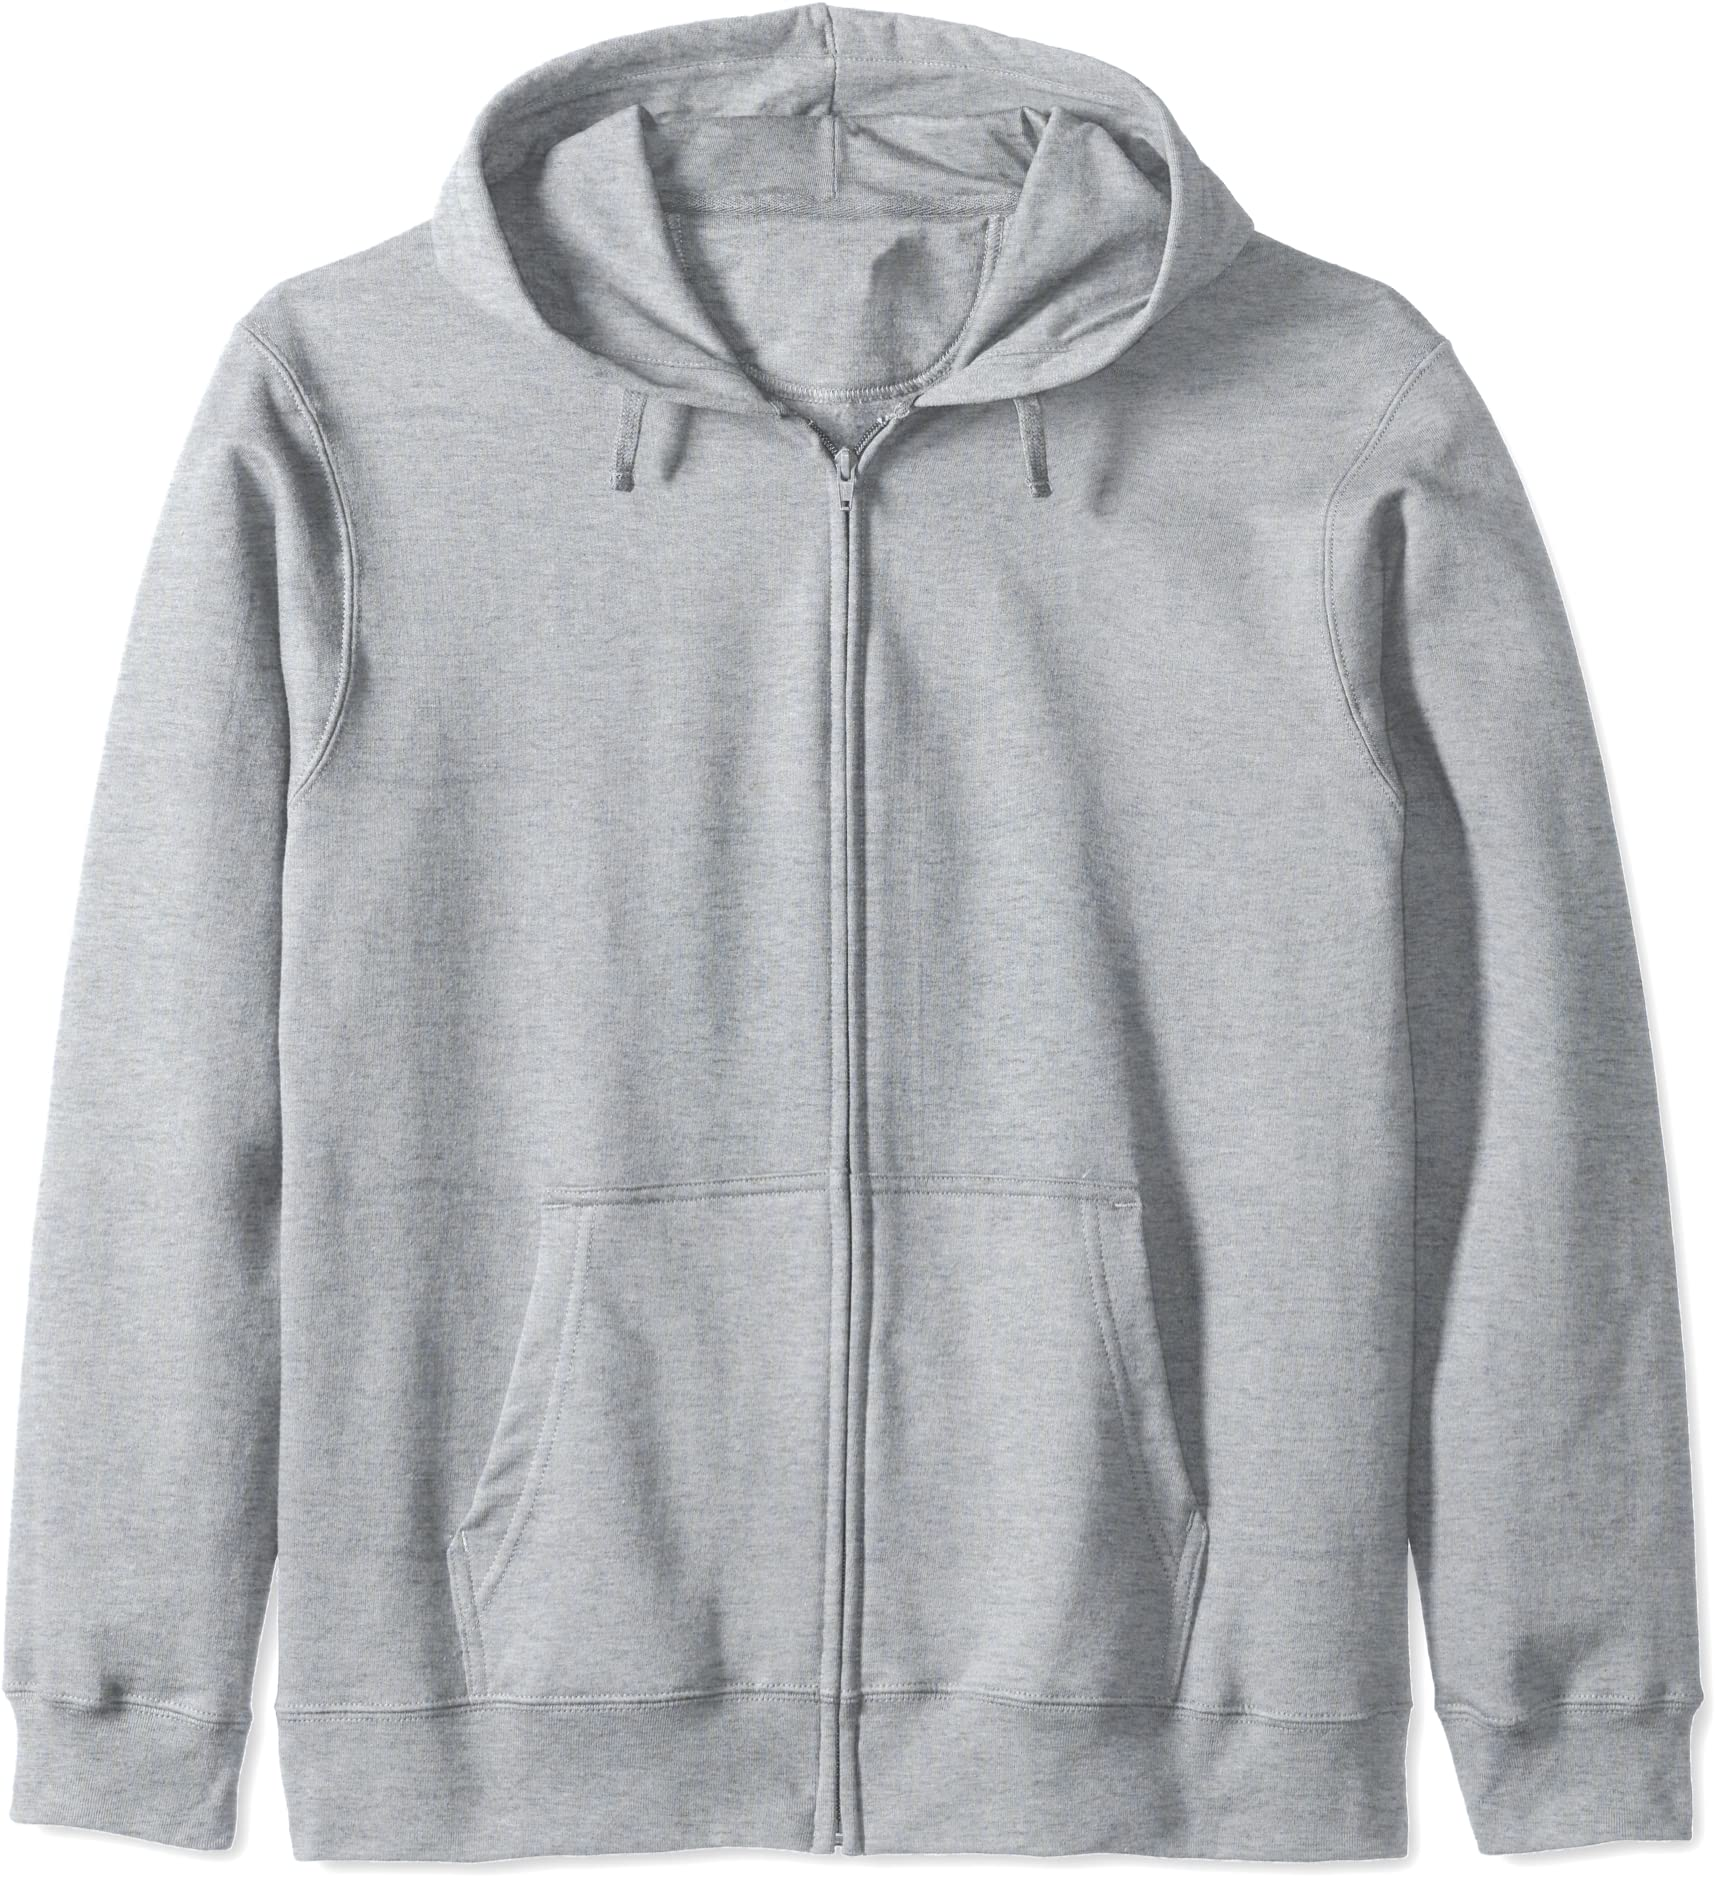 Basic Witch Unisex CREWNECK Sweatshirt Halloween Design Funny Boo Witch Sweater